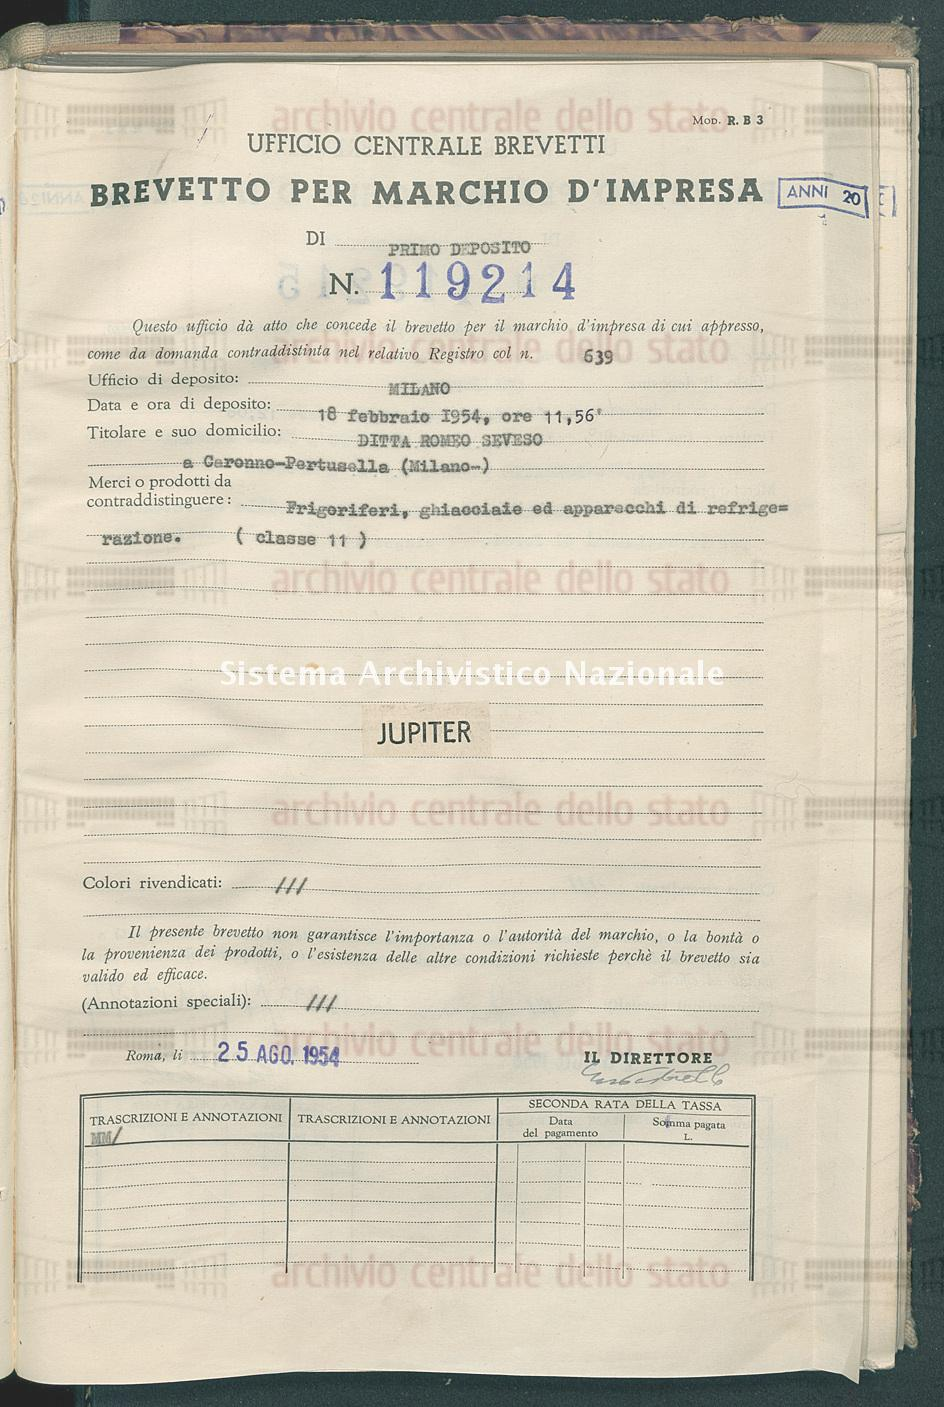 Frigoriferi, ghiacciaie ed ecc. Ditta Romeo Seveso (25/08/1954)